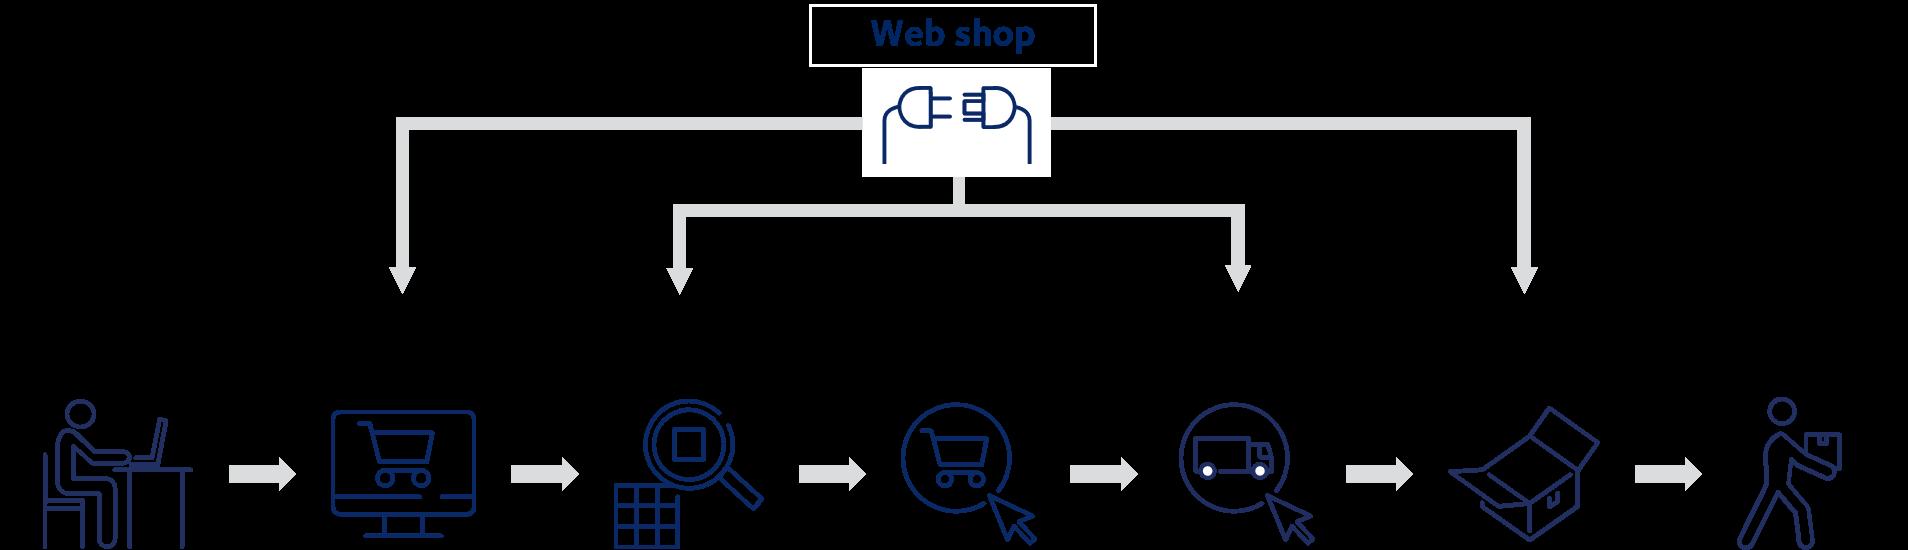 web shop ecommerce solutions